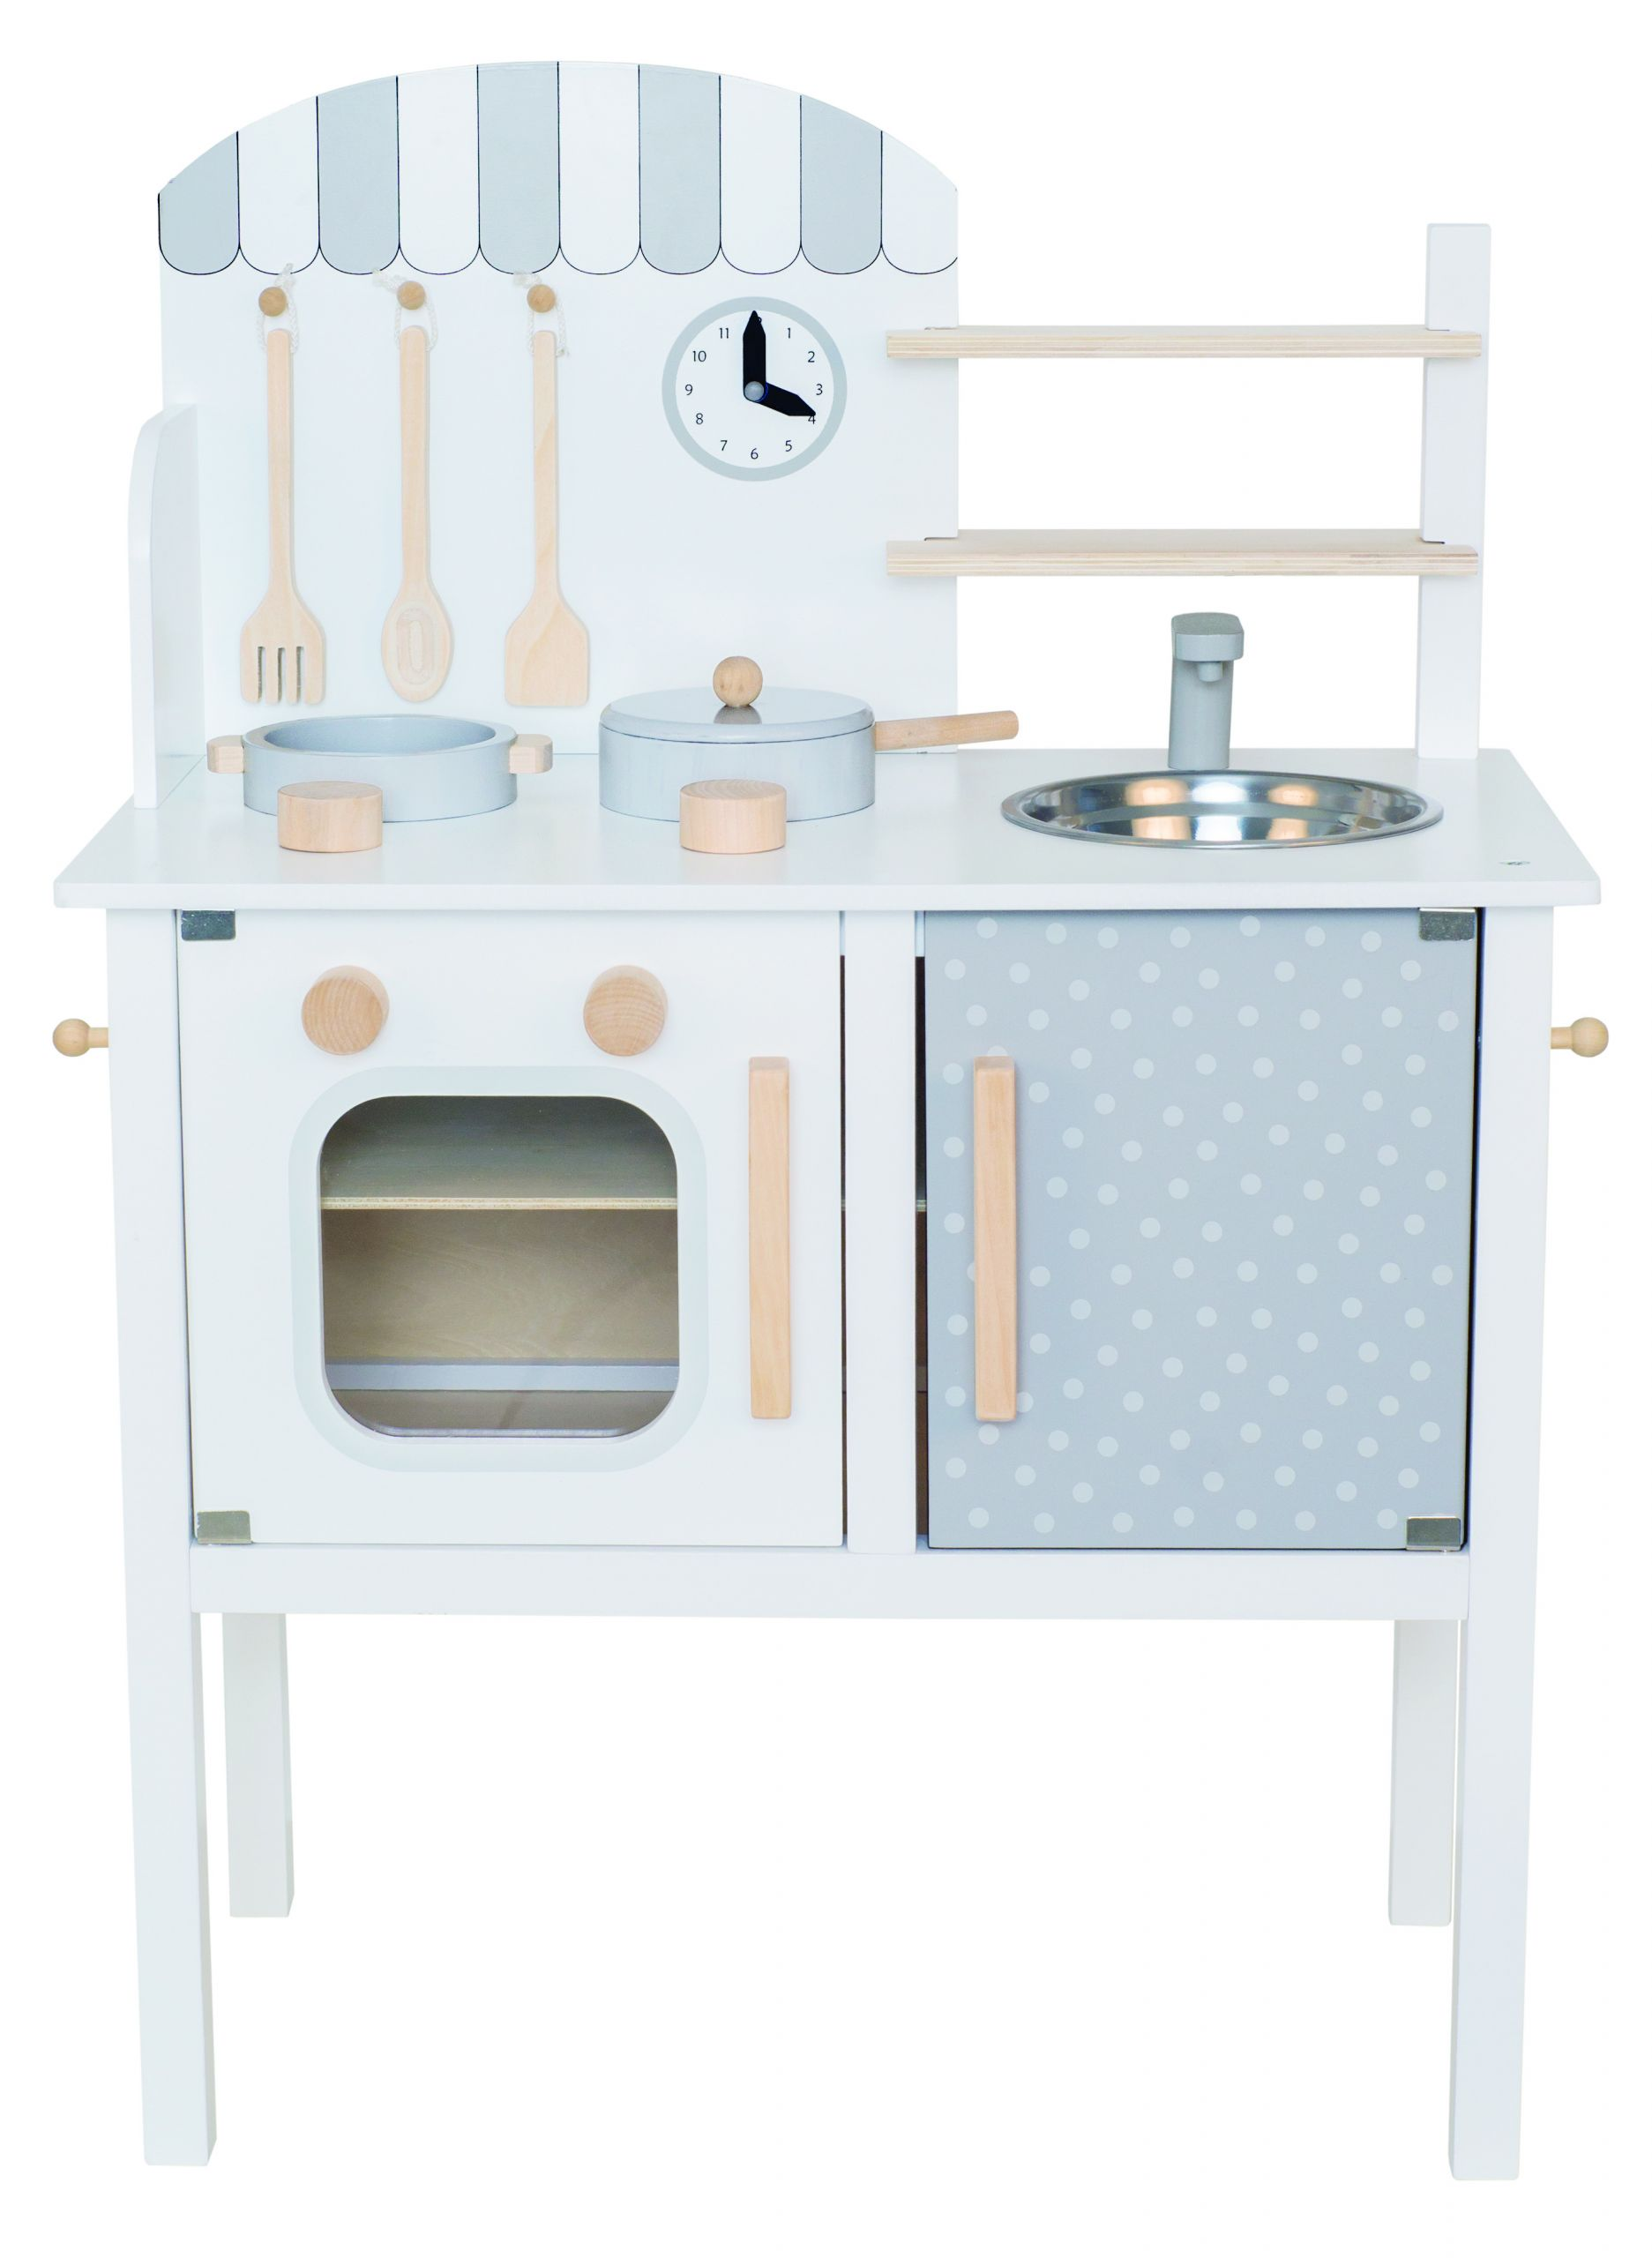 W7125 Kitchen with pot pan white